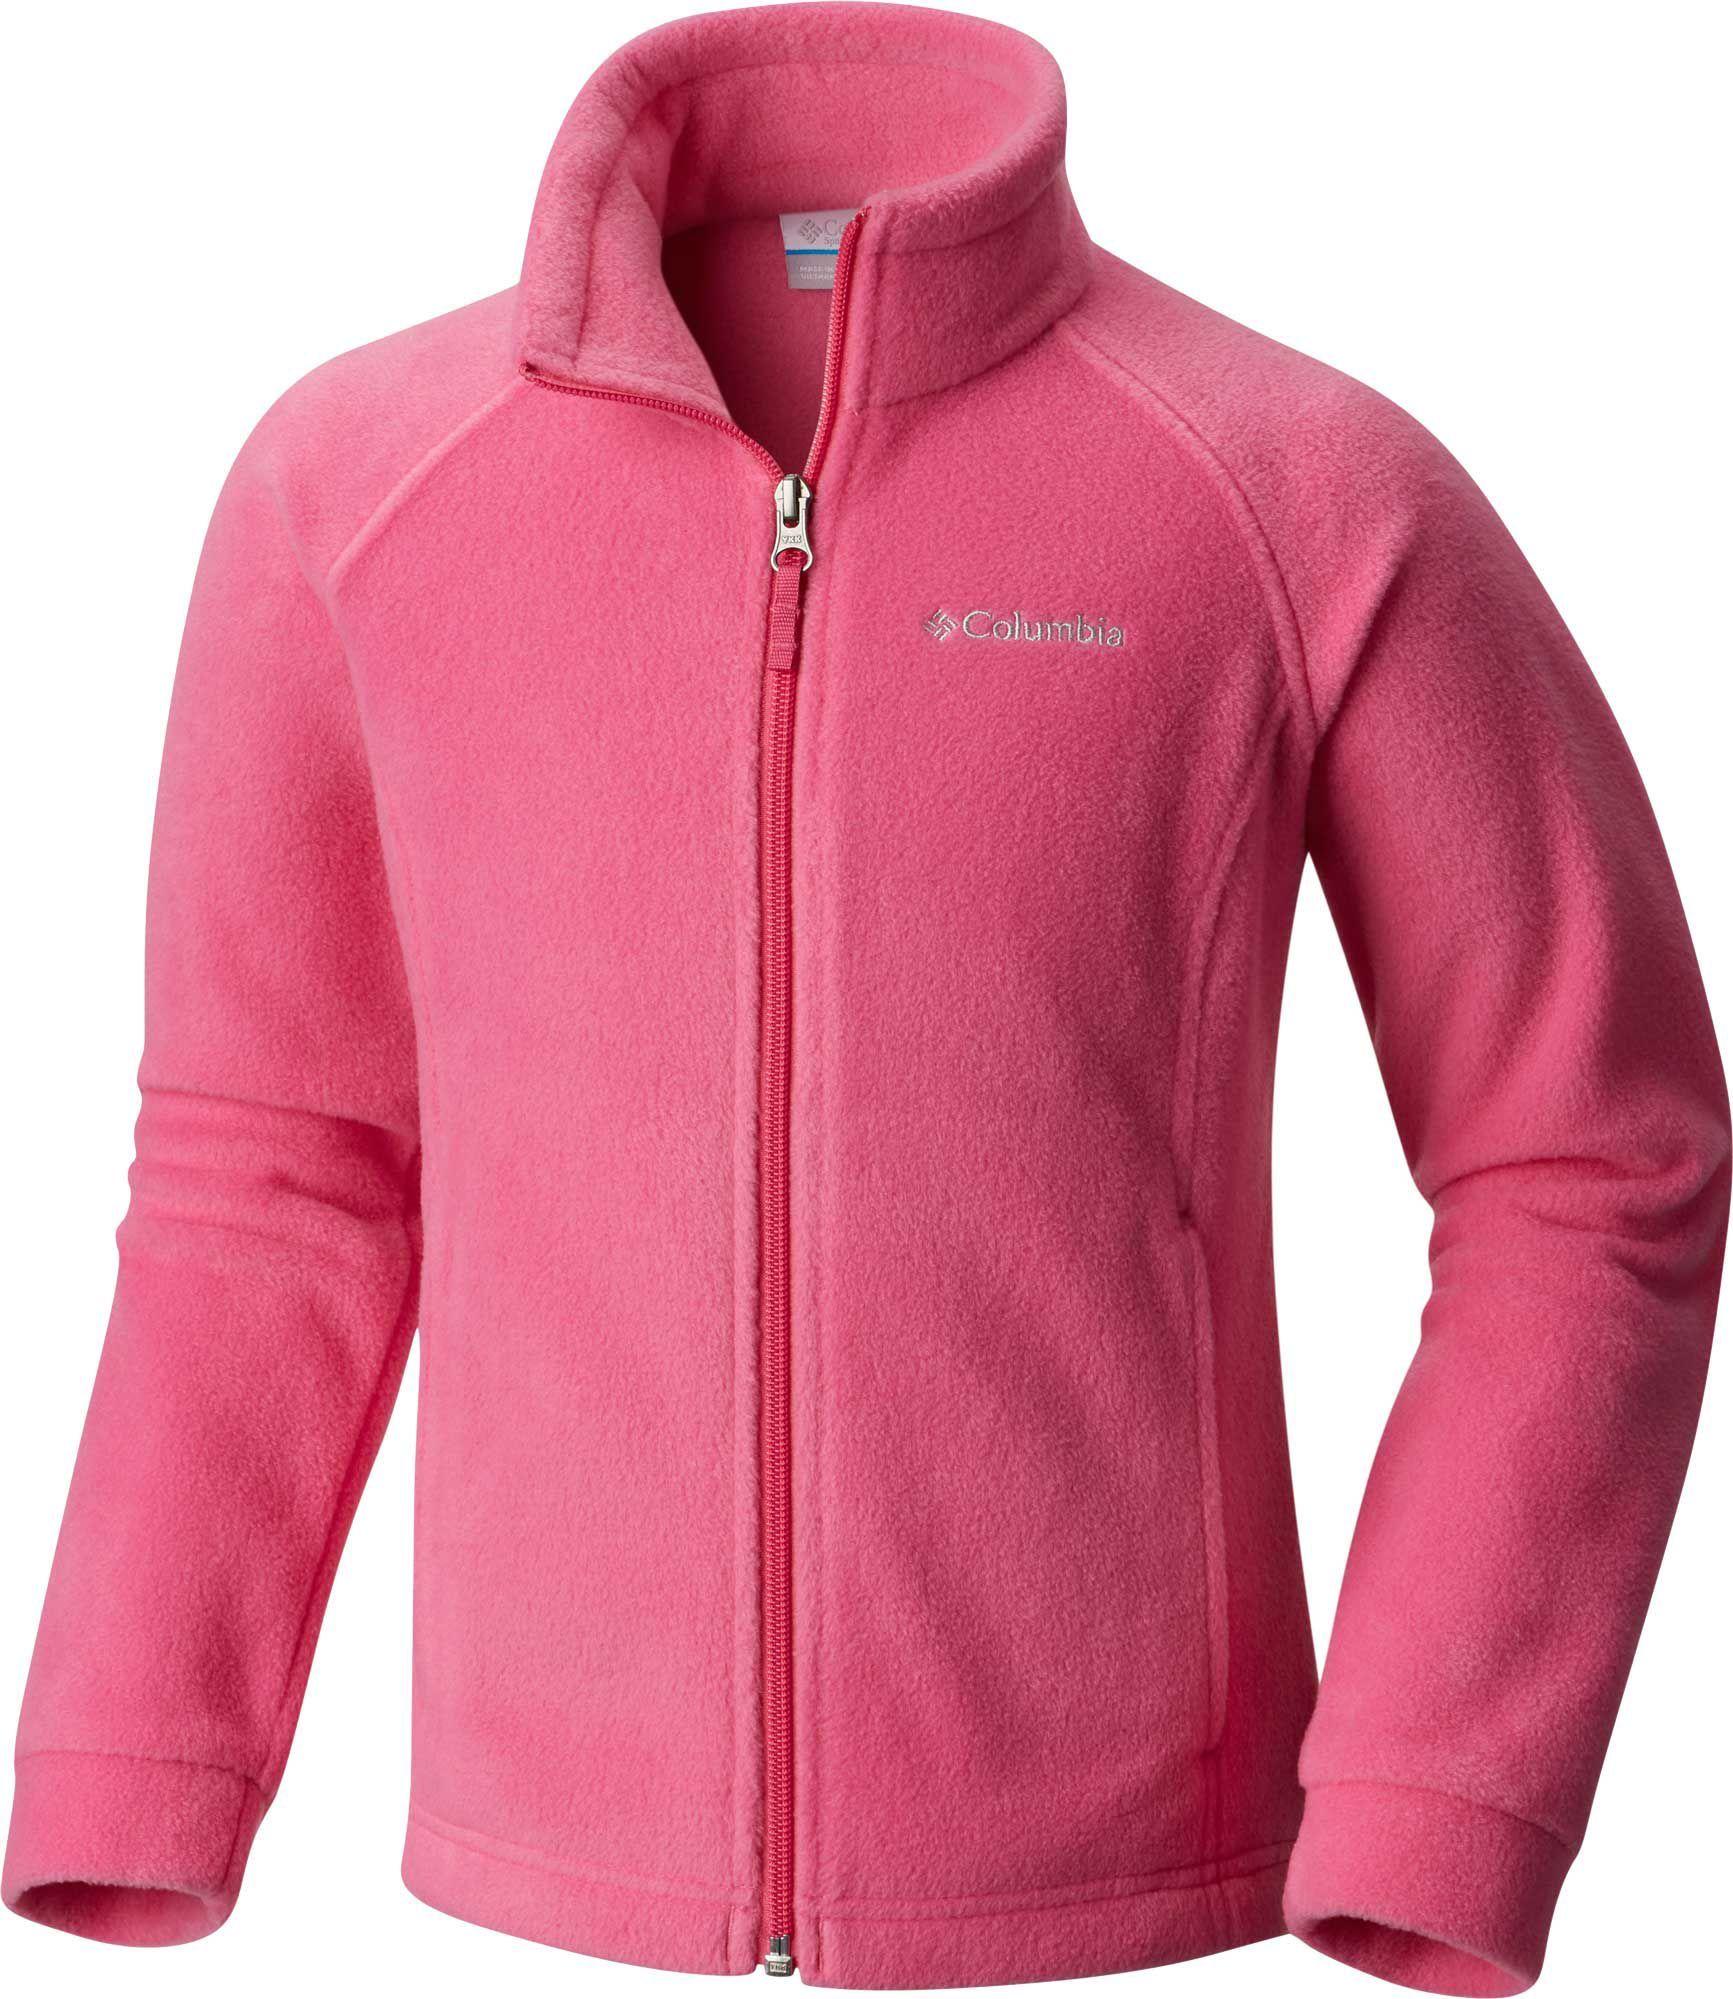 45eb9eecb Columbia Girls' Benton Springs Fleece Jacket | Products | Jackets ...